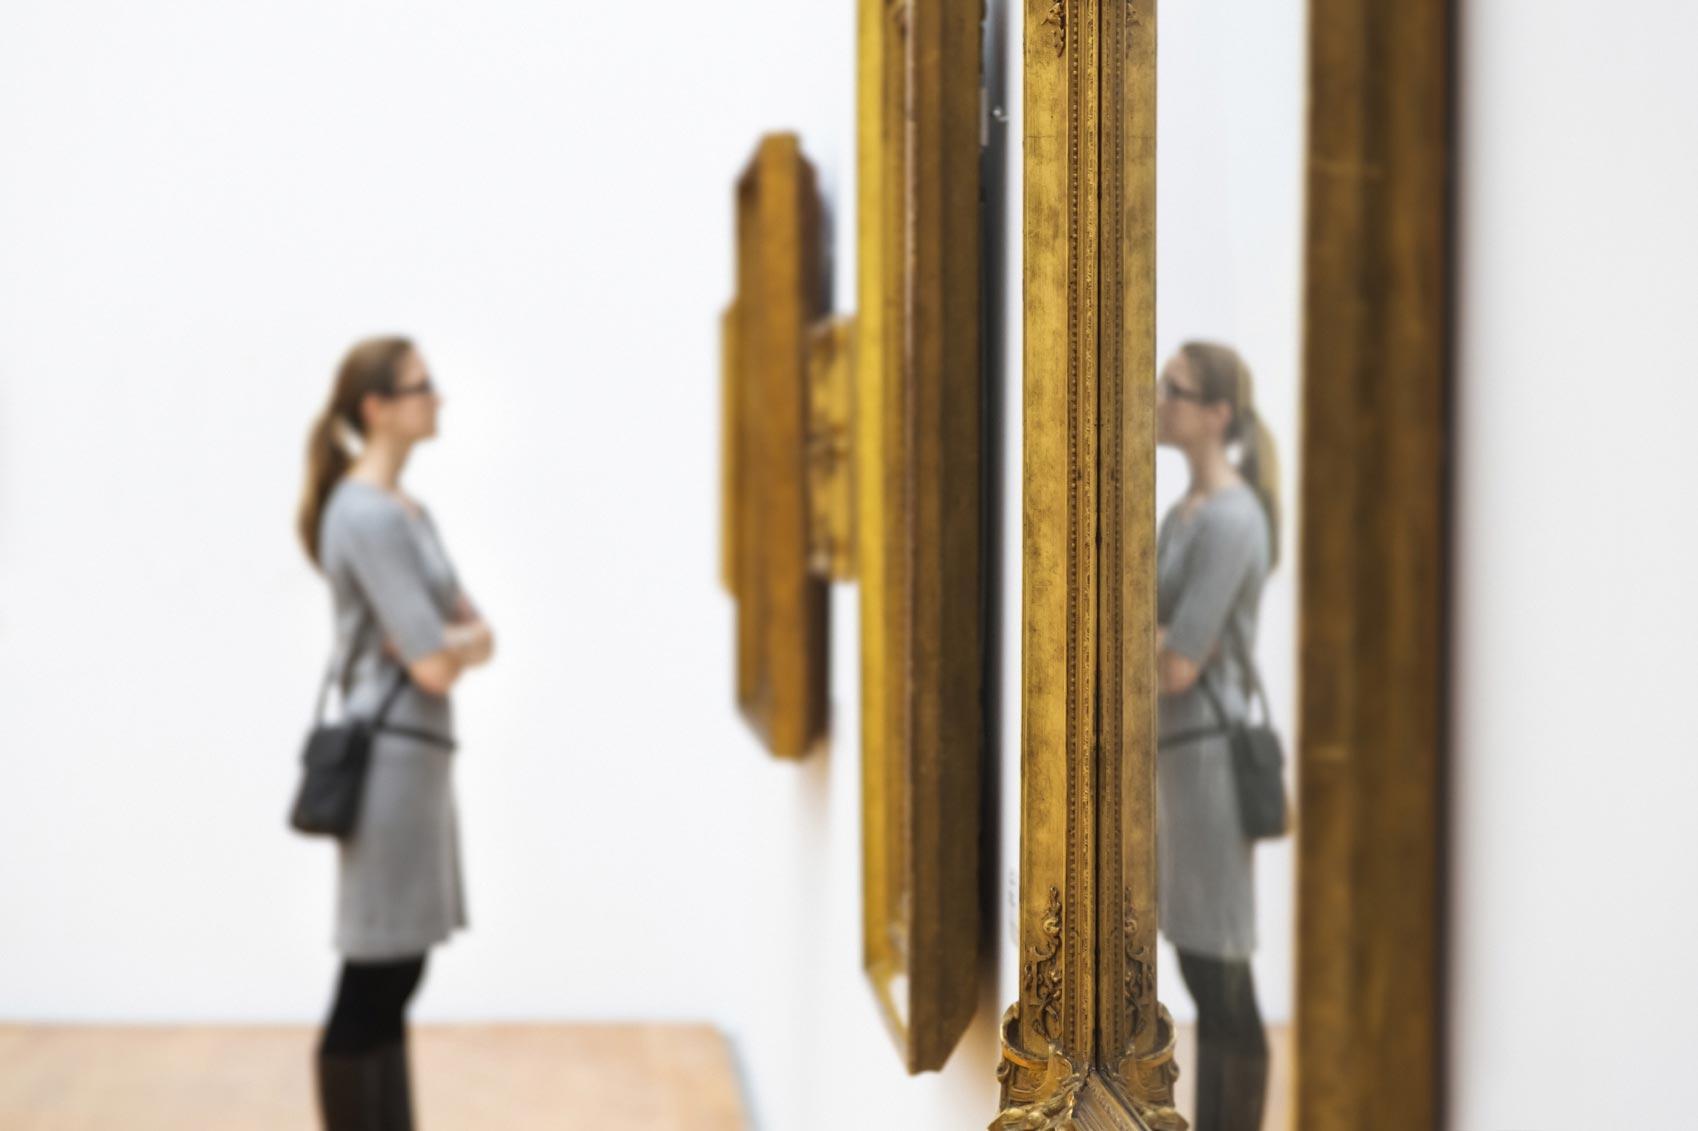 Visiter un musée au calme